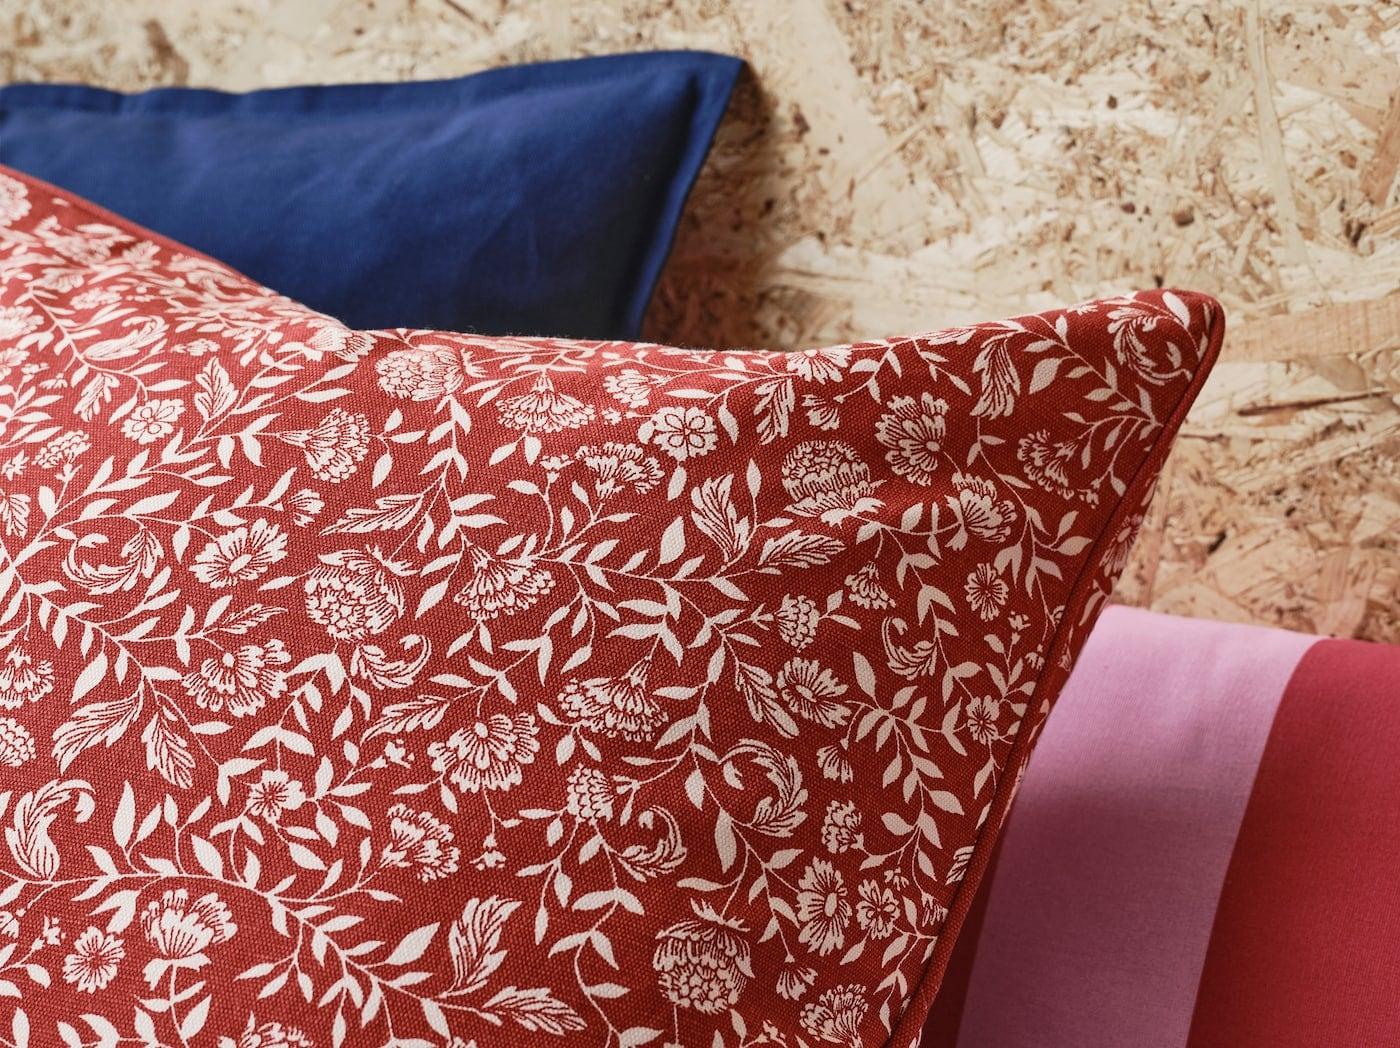 Detail povlaku na polštář EVALOUISE s tradičním skandinávským květinových vzorem v červené a bílé